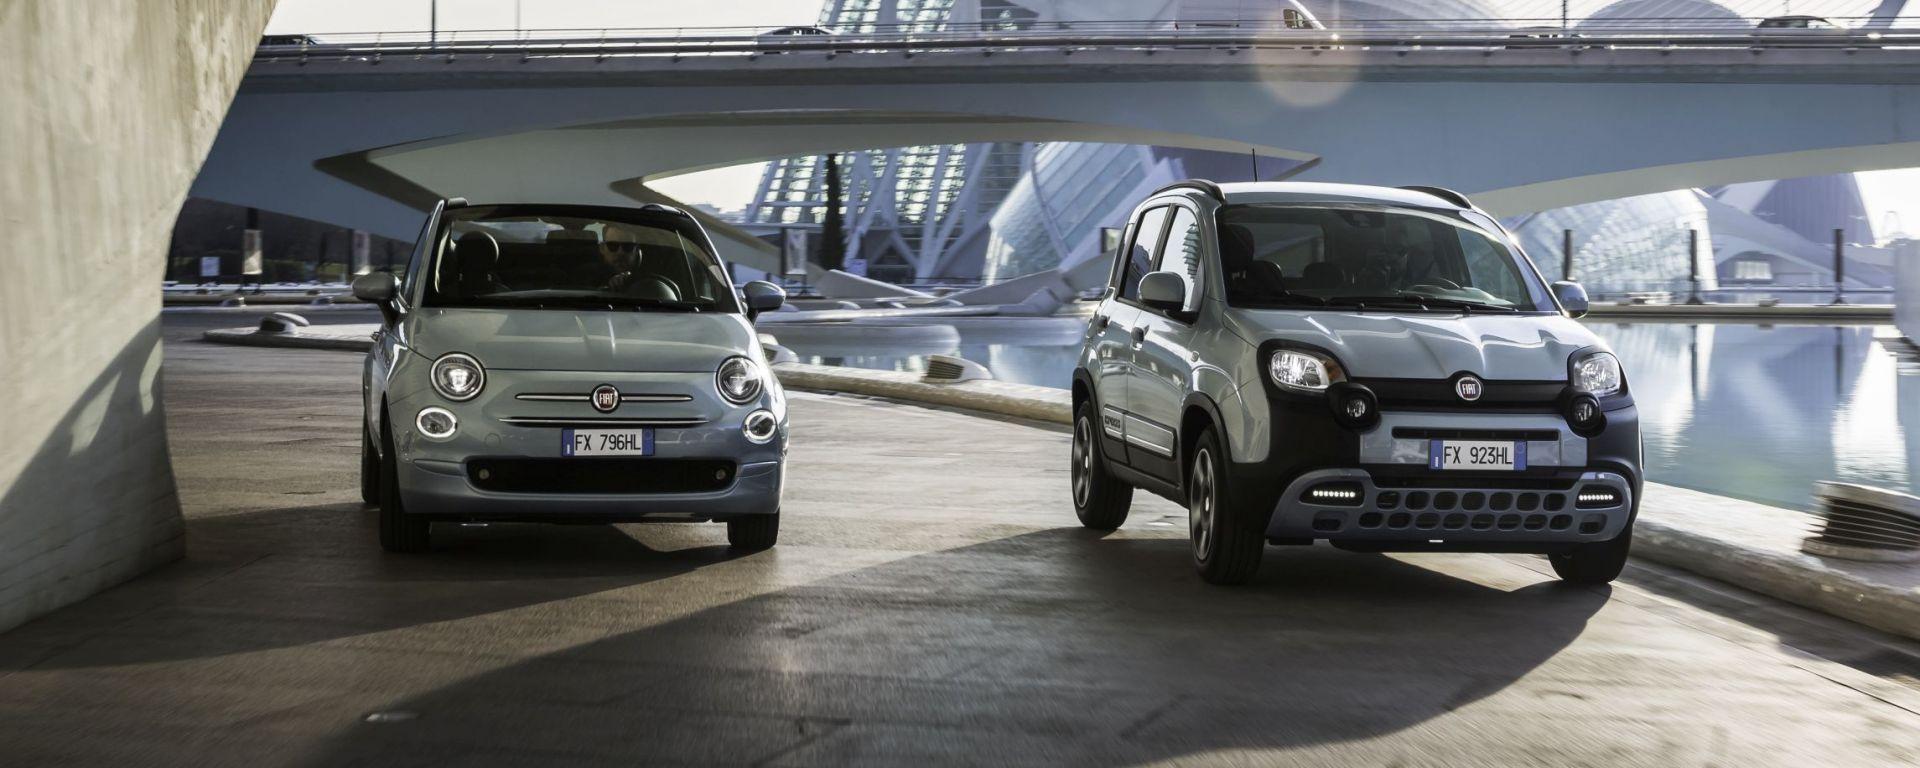 Fiat Panda e Fiat 500 ibride